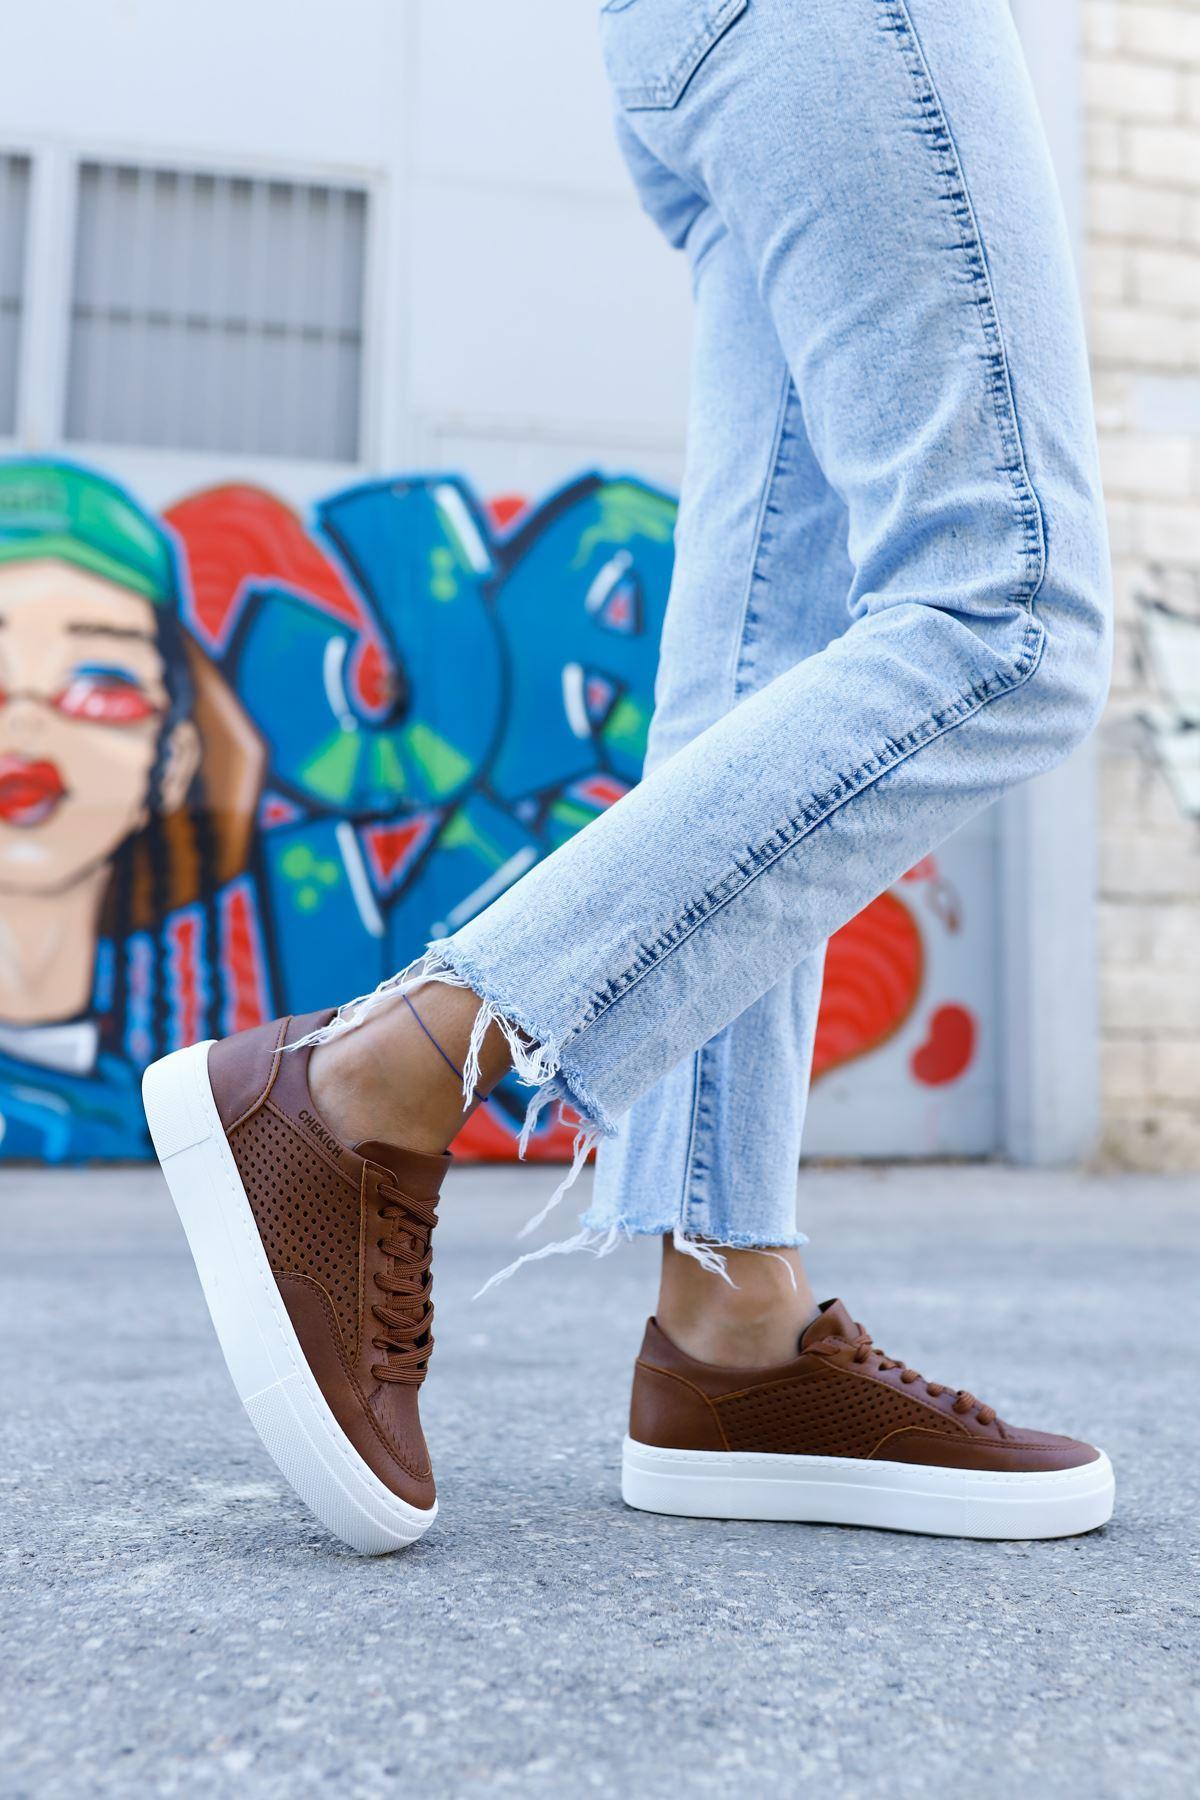 Chekich CH015 BT Kadın Ayakkabı TABA